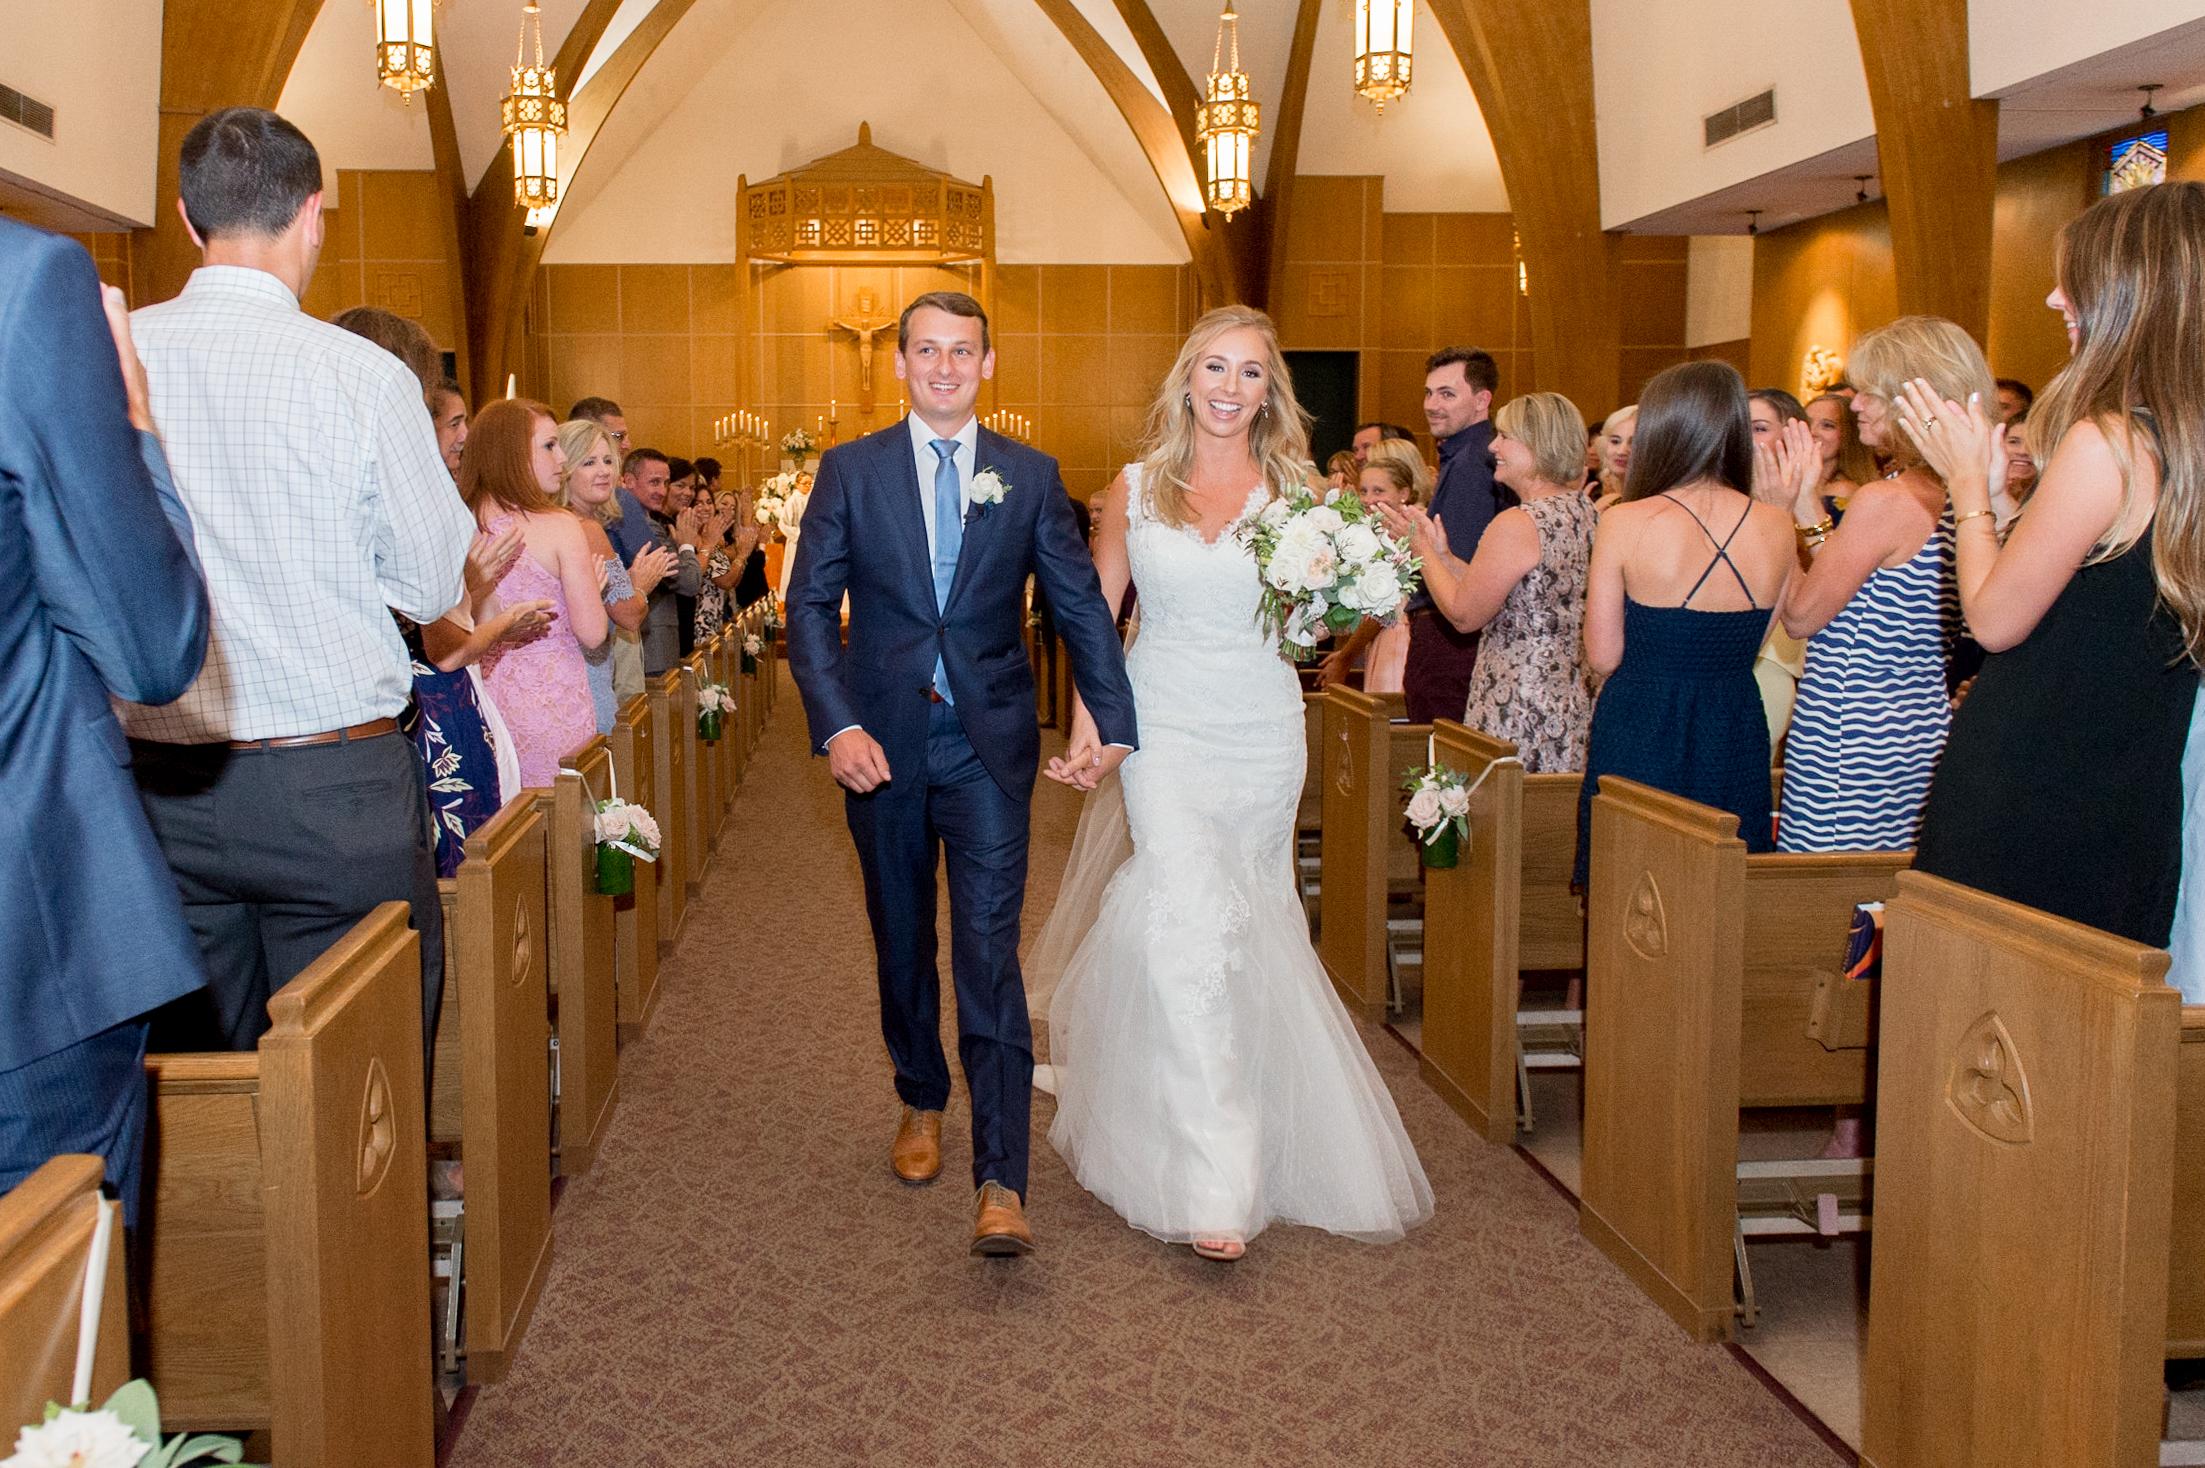 Bridalbliss.com | Portland Wedding | Oregon Event Planning and Design |  Powers Studio Photography